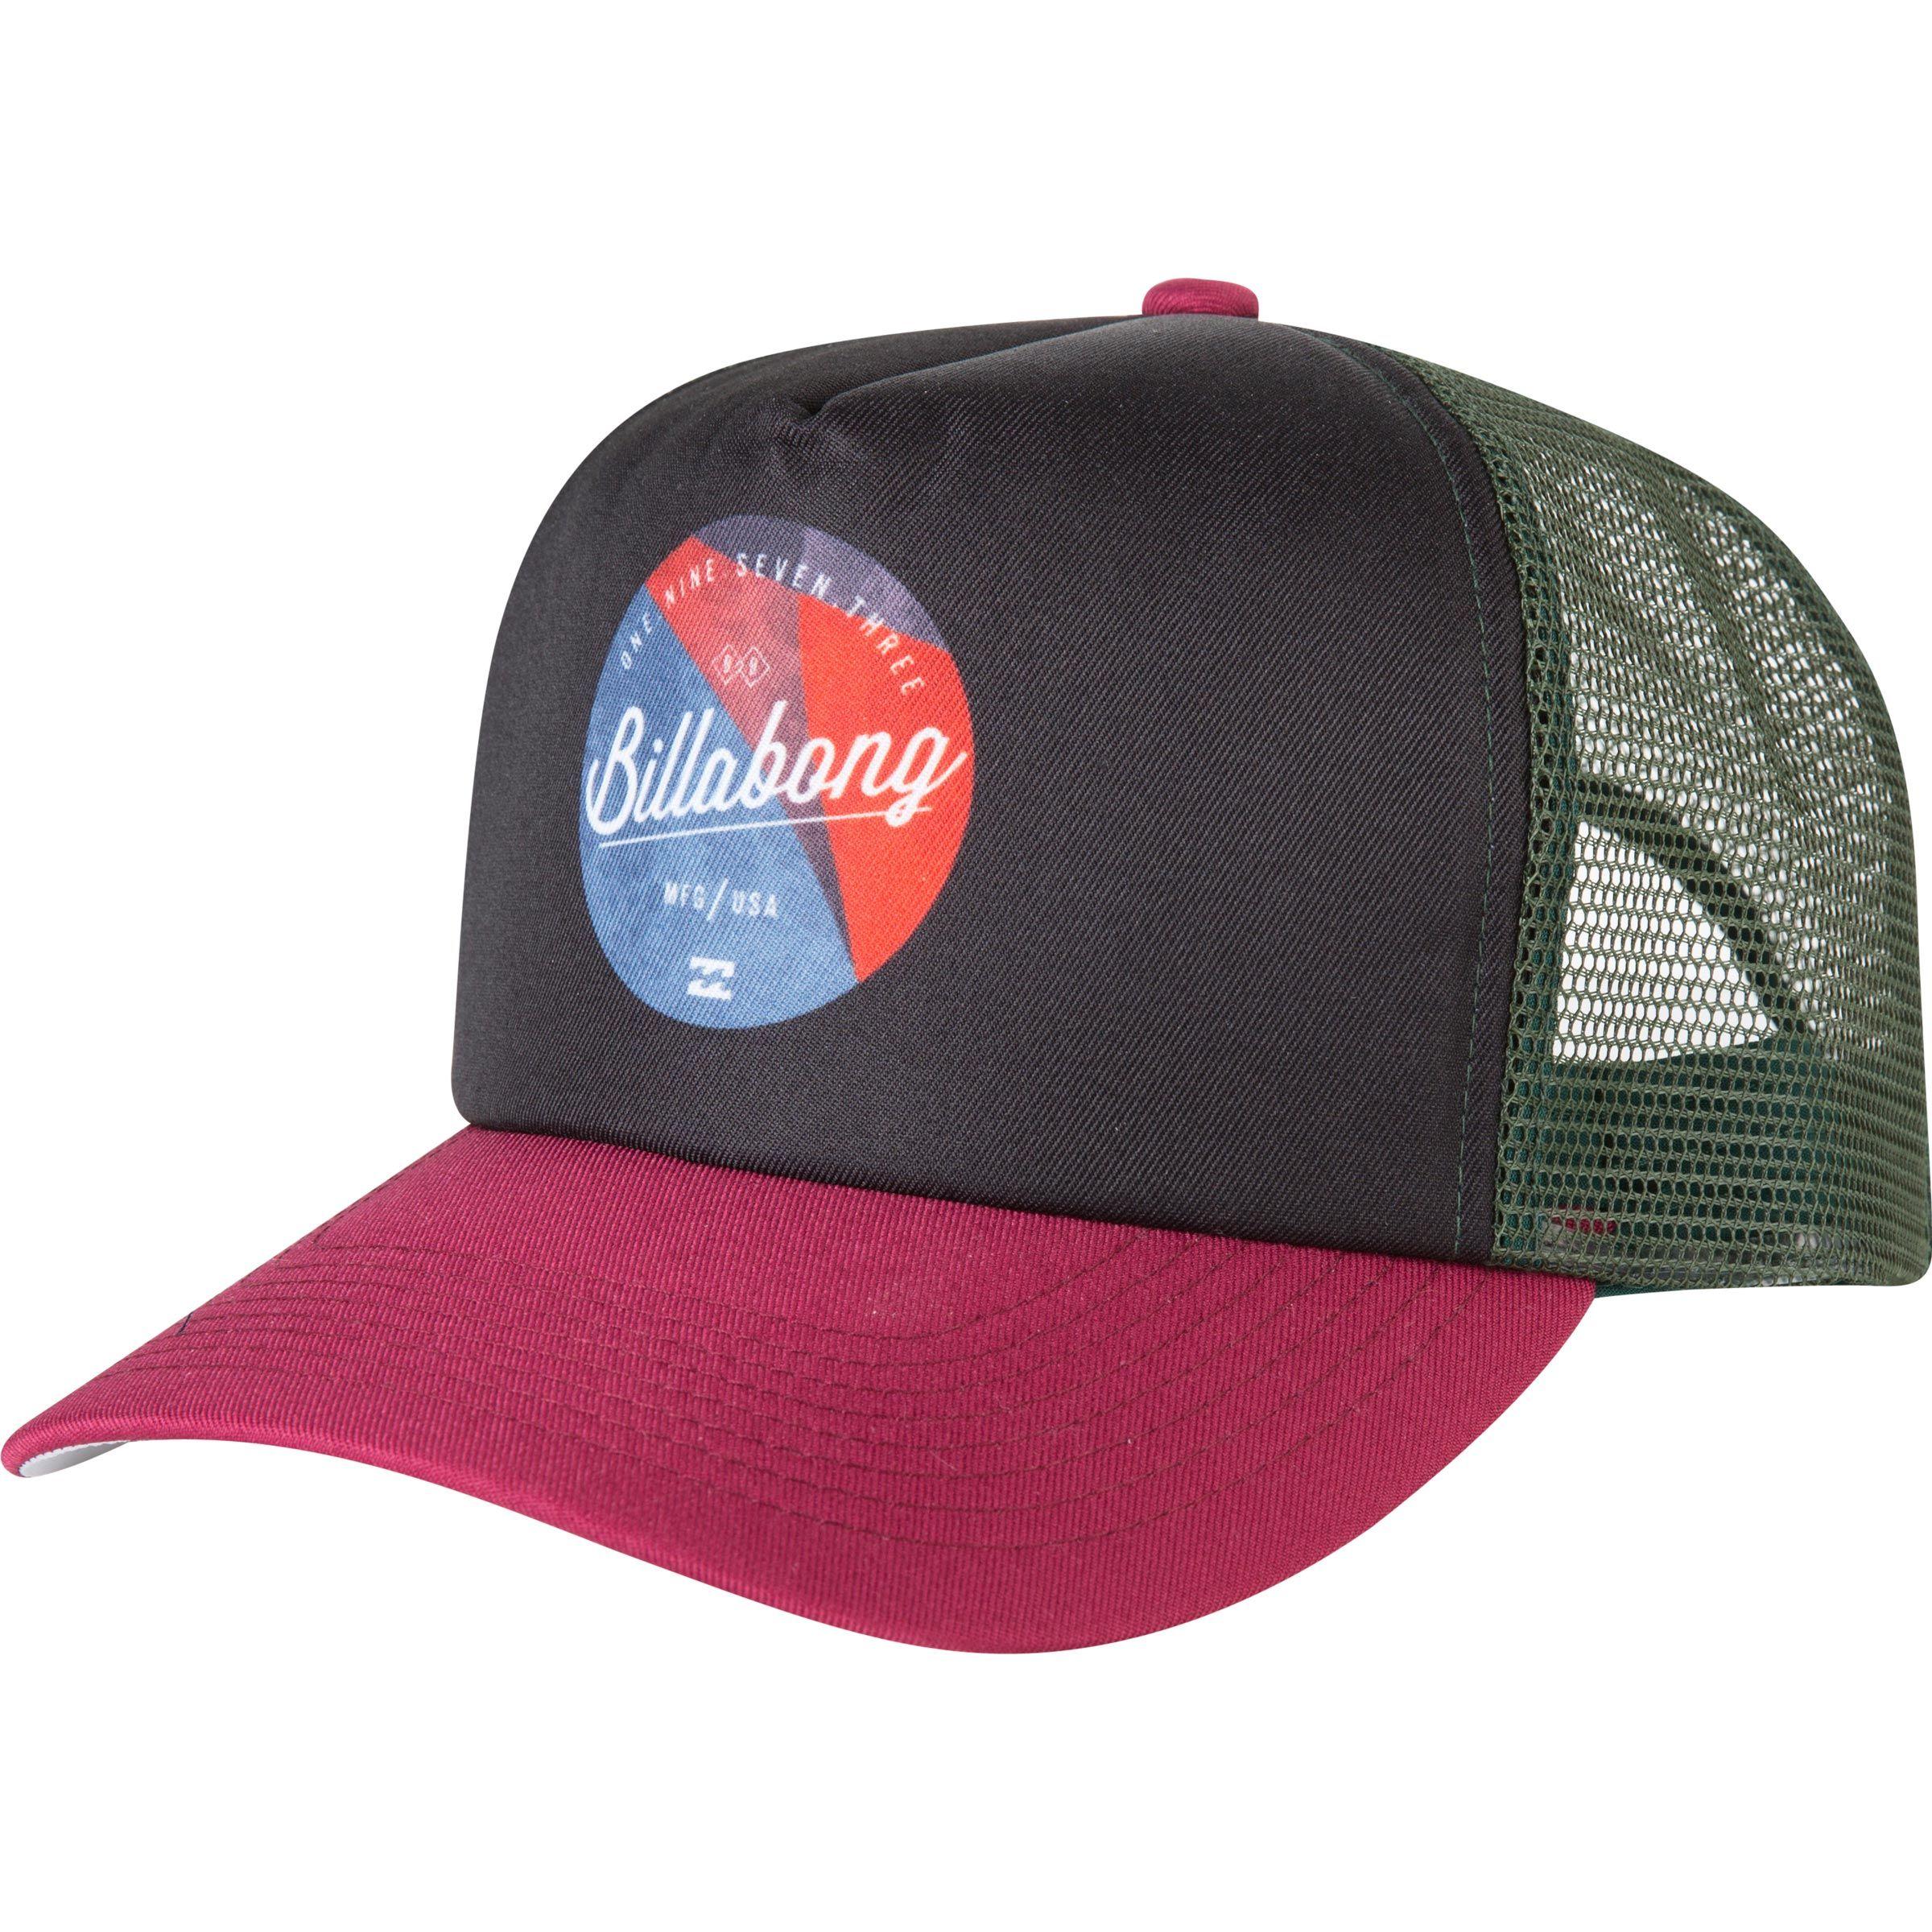 Rounder Trucker Hat  0de8d01ce7